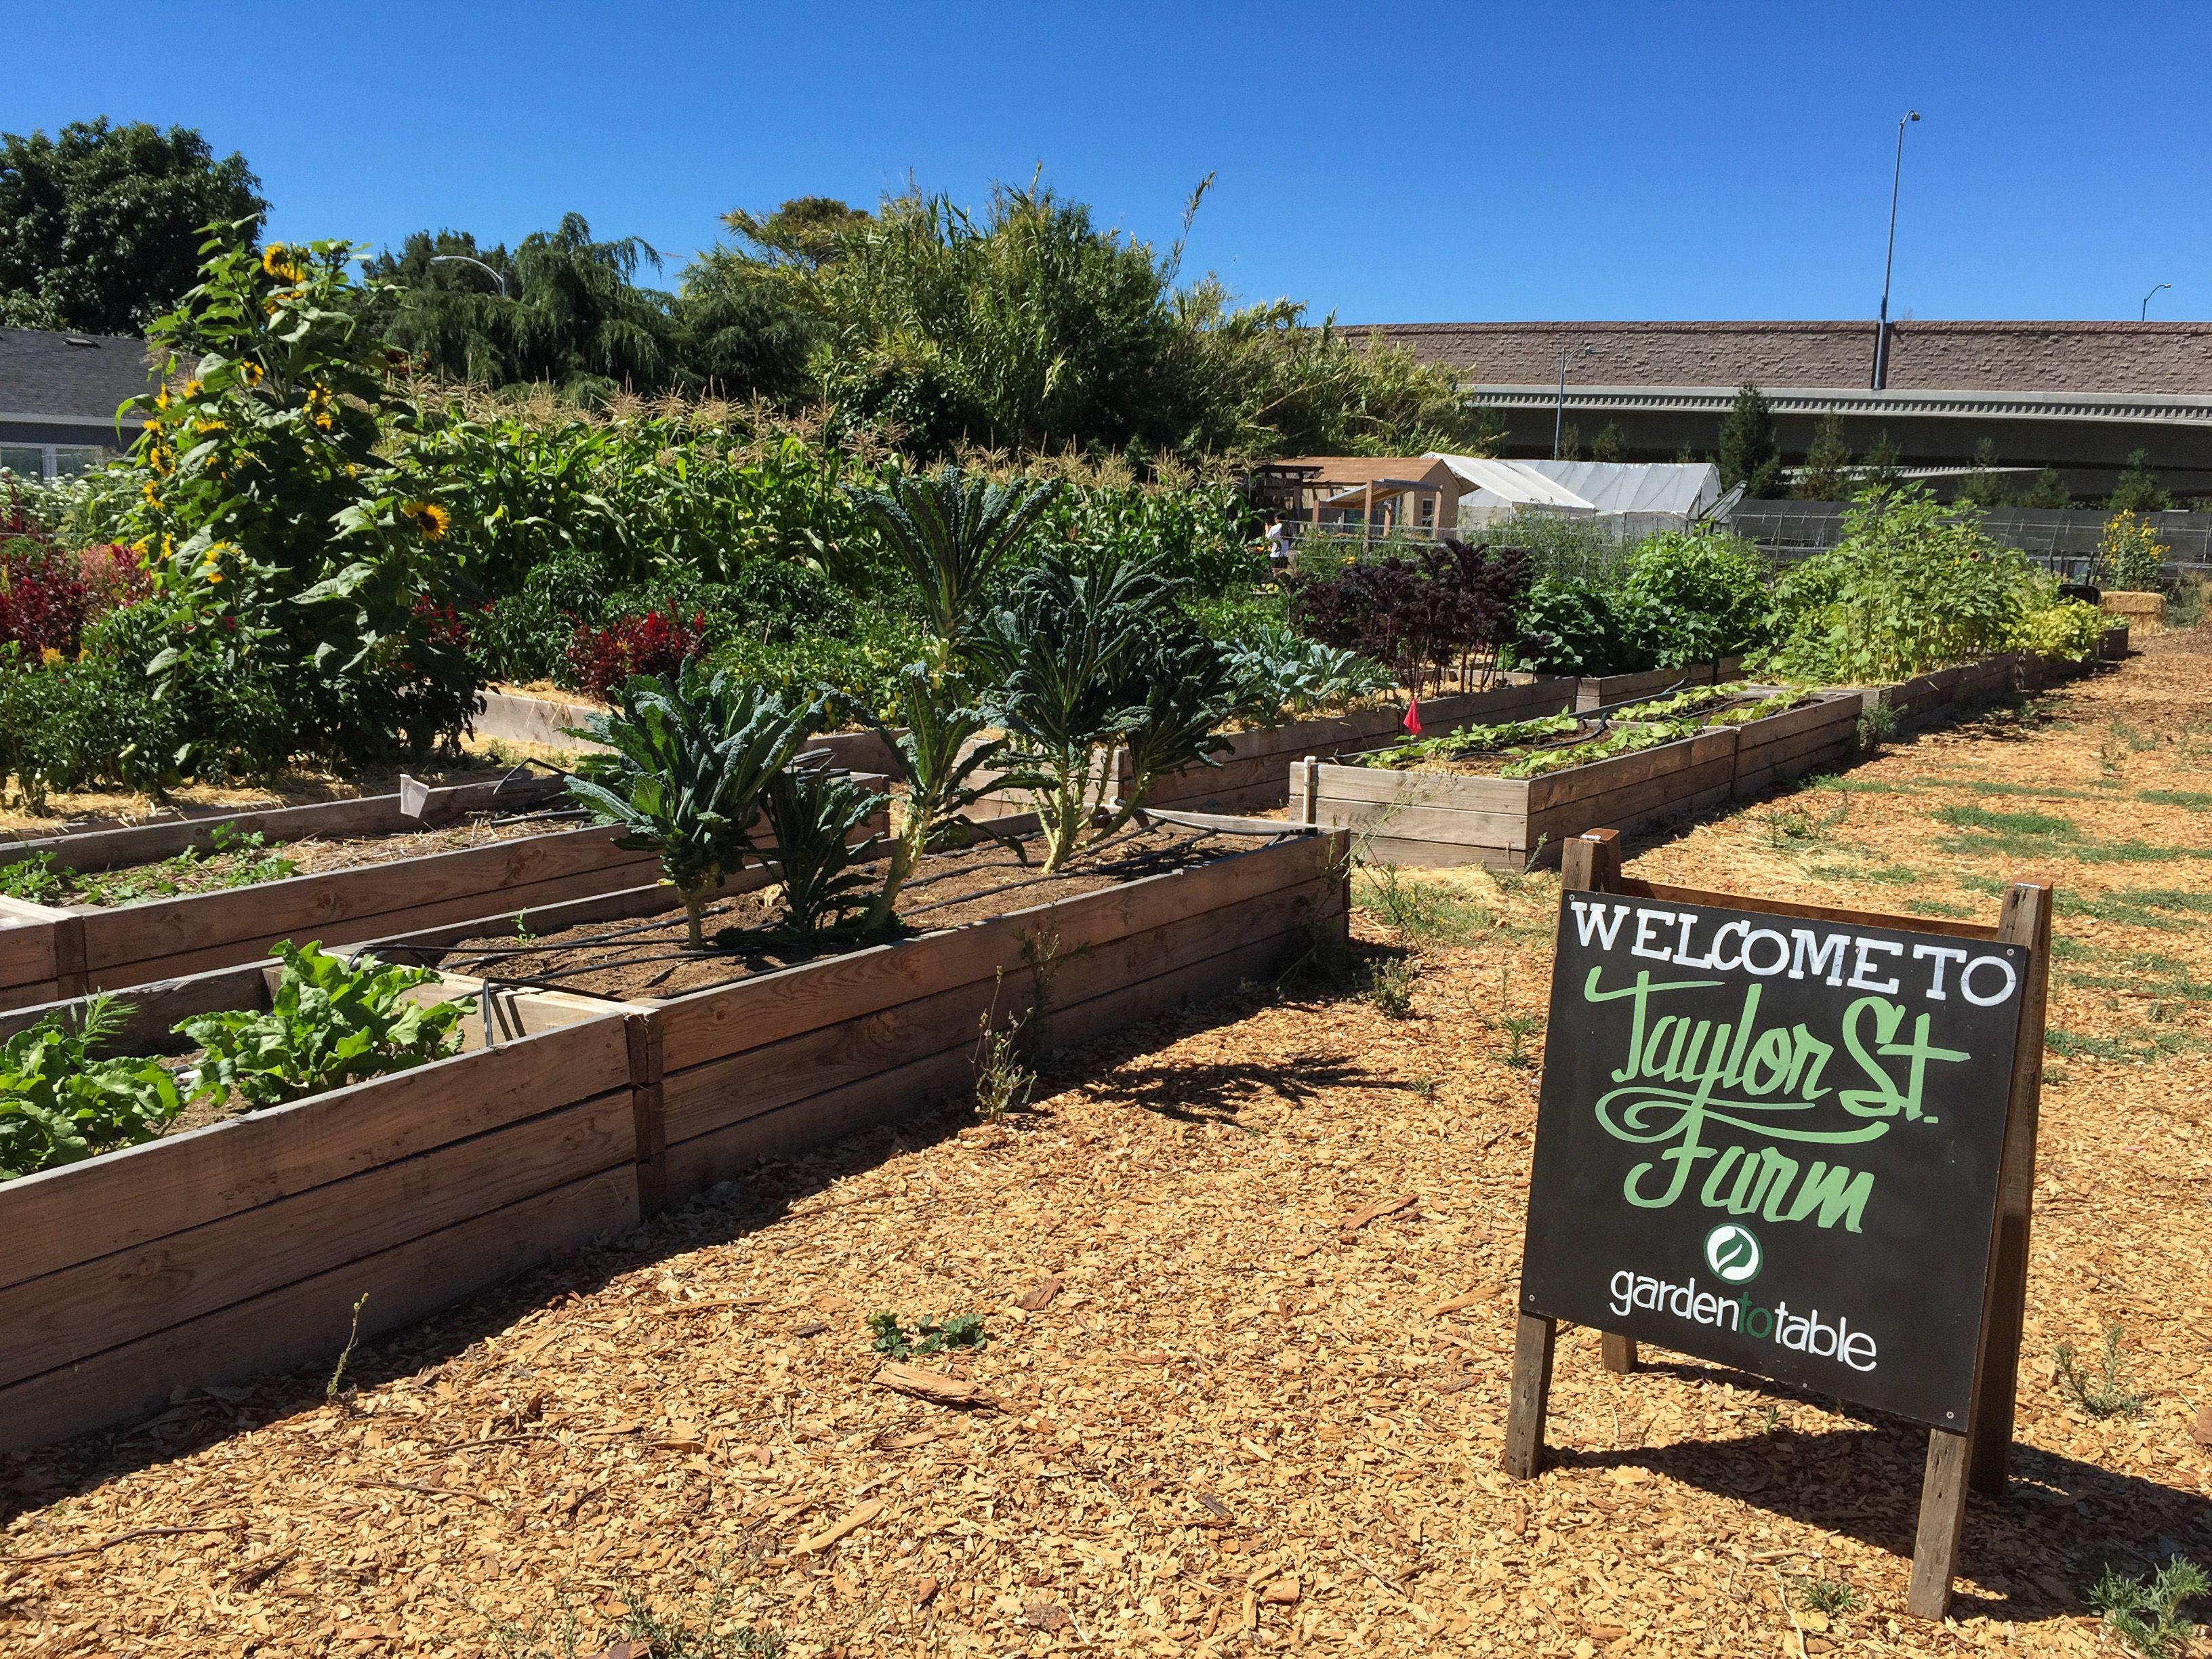 The Taylor Street Farm, Urban Farm in San Jose